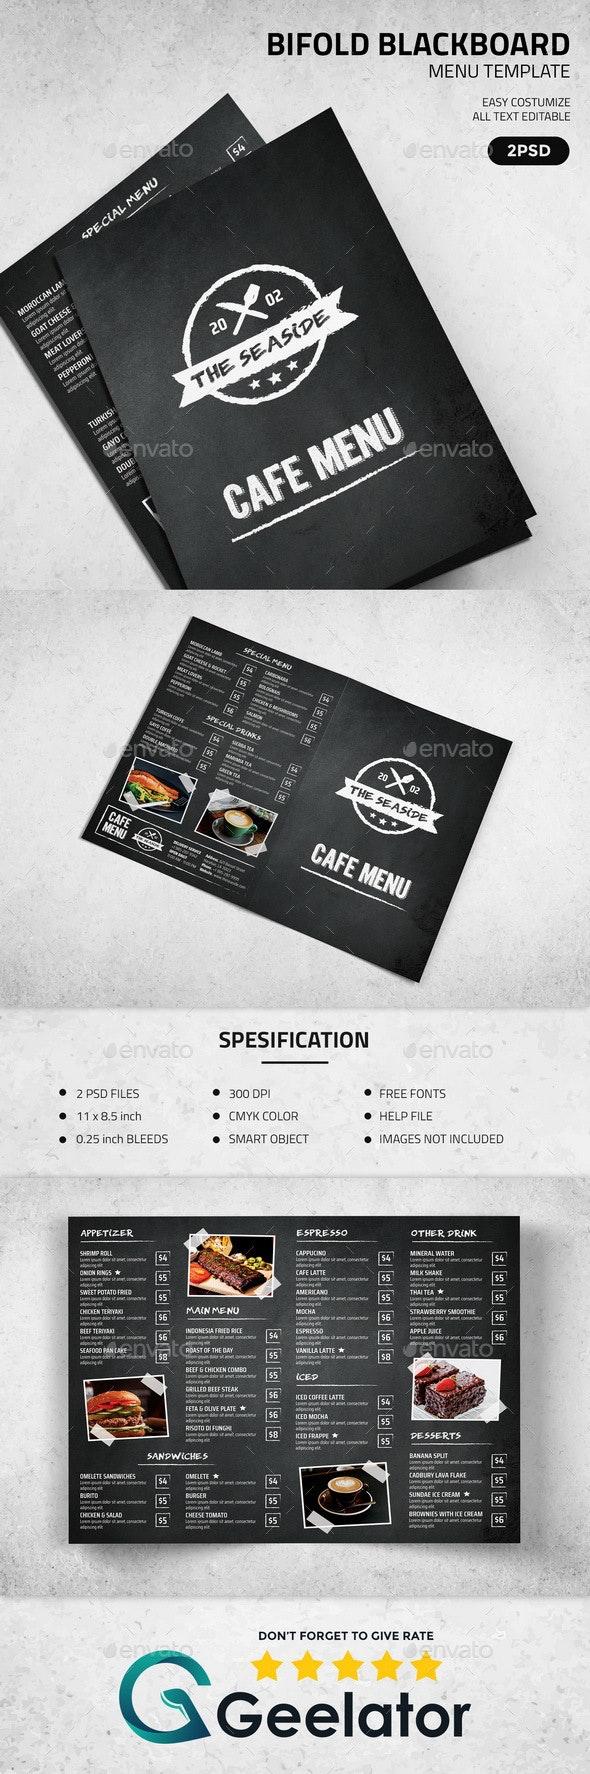 BiFold Blackboard Menu Template - Food Menus Print Templates